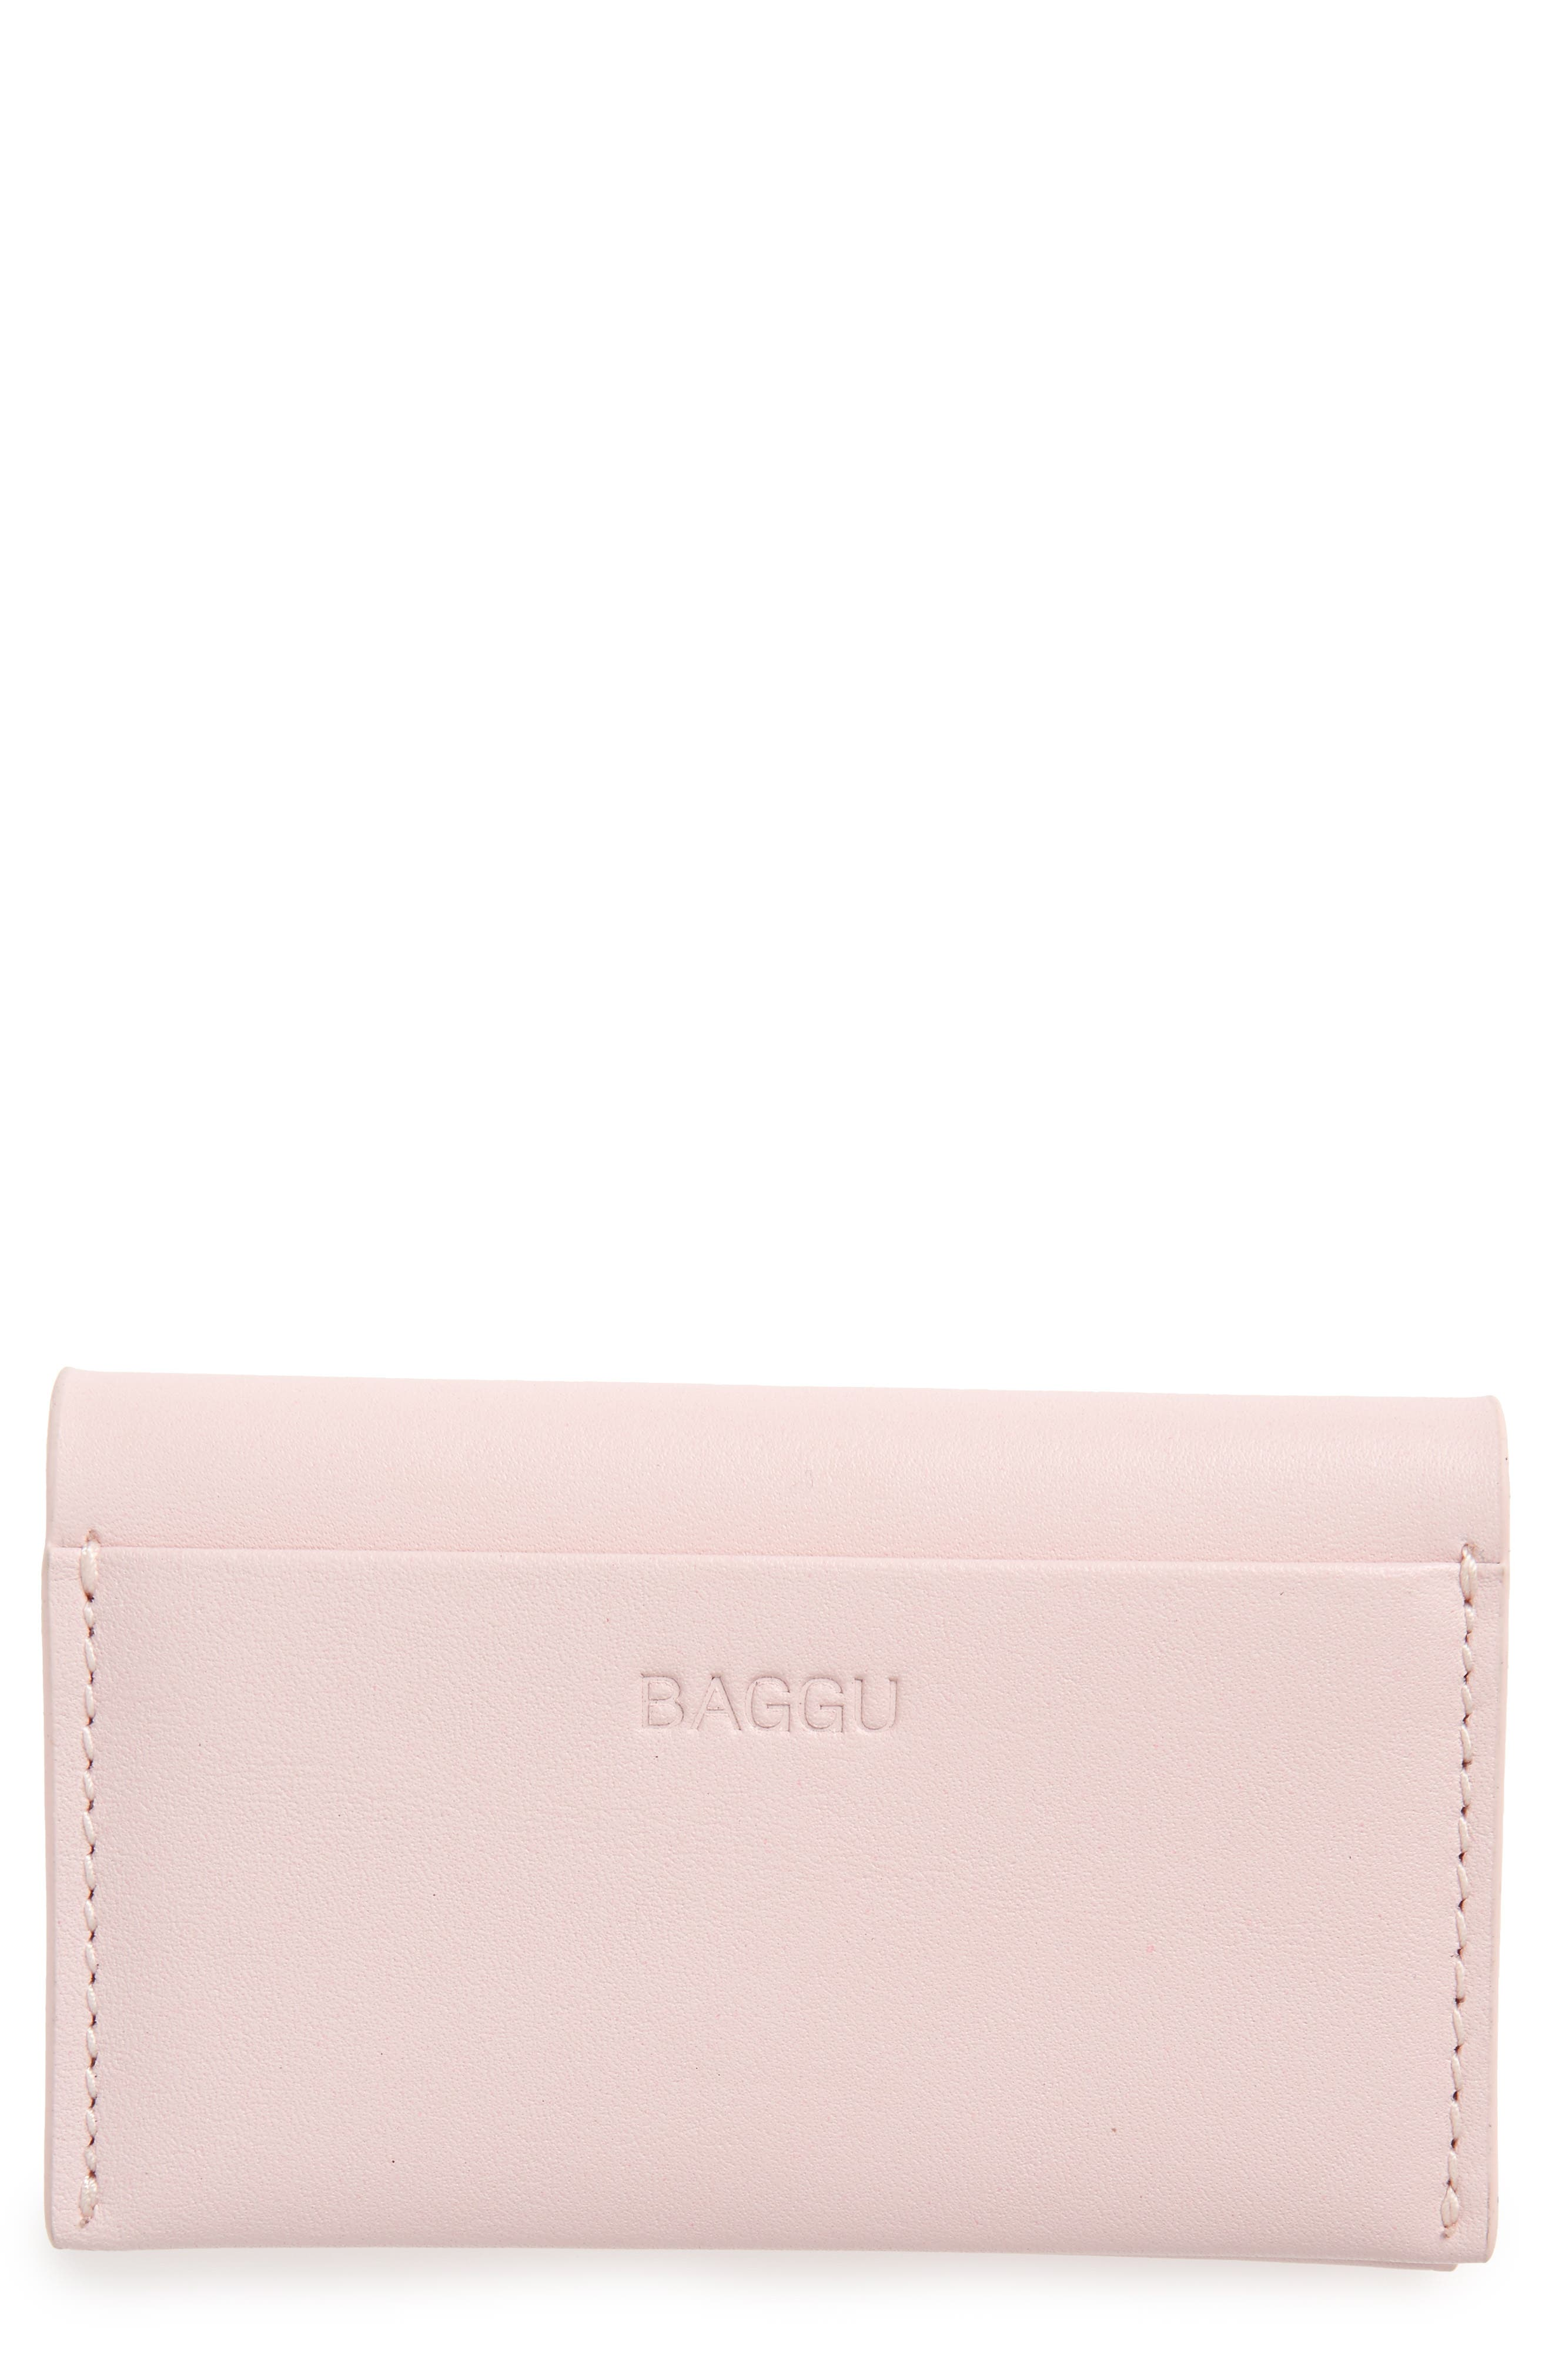 Main Image - Baggu Leather Card Case